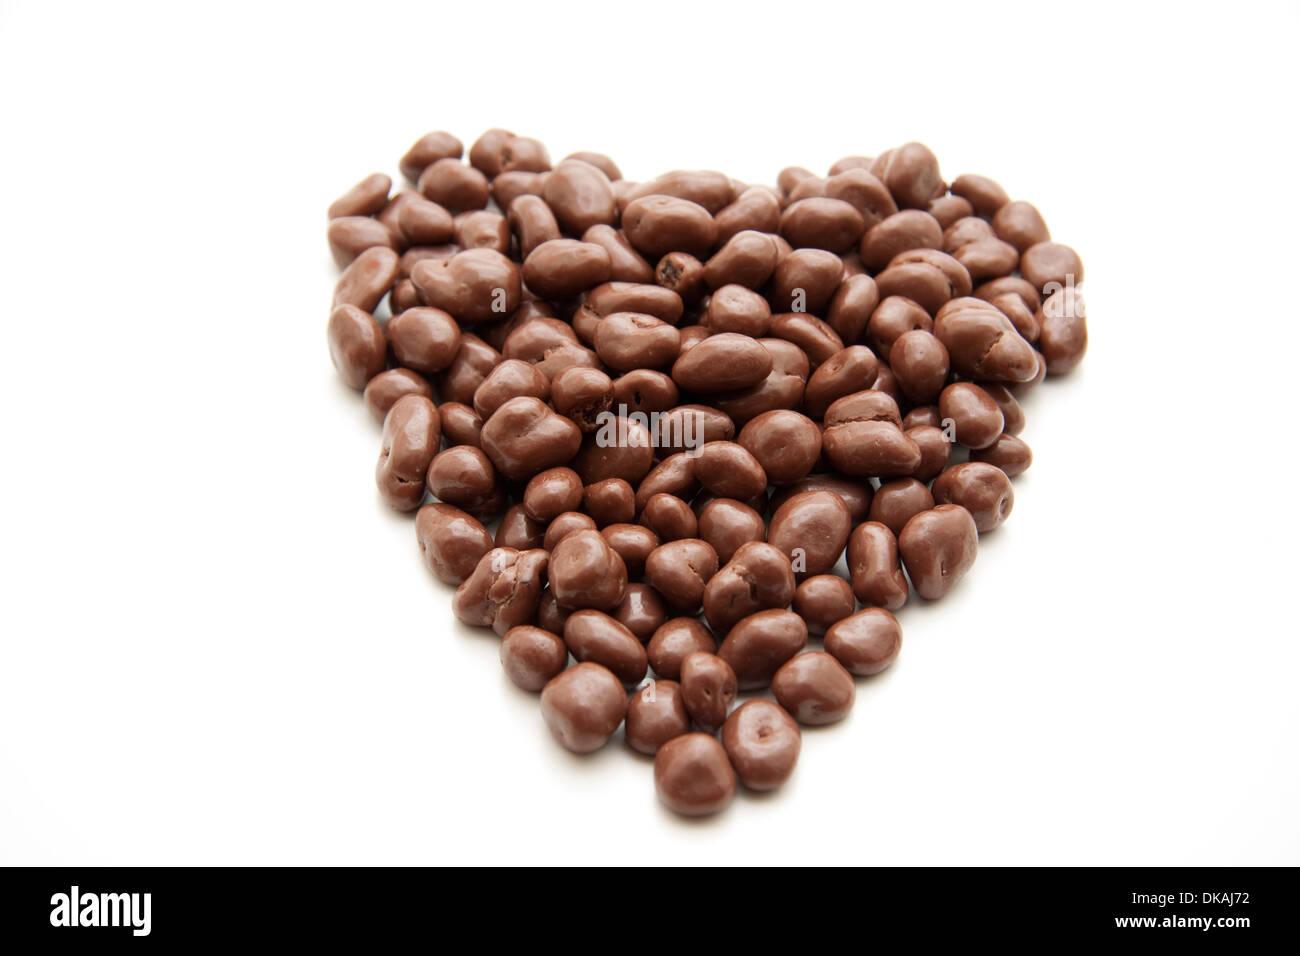 Chocolate raisins - Stock Image